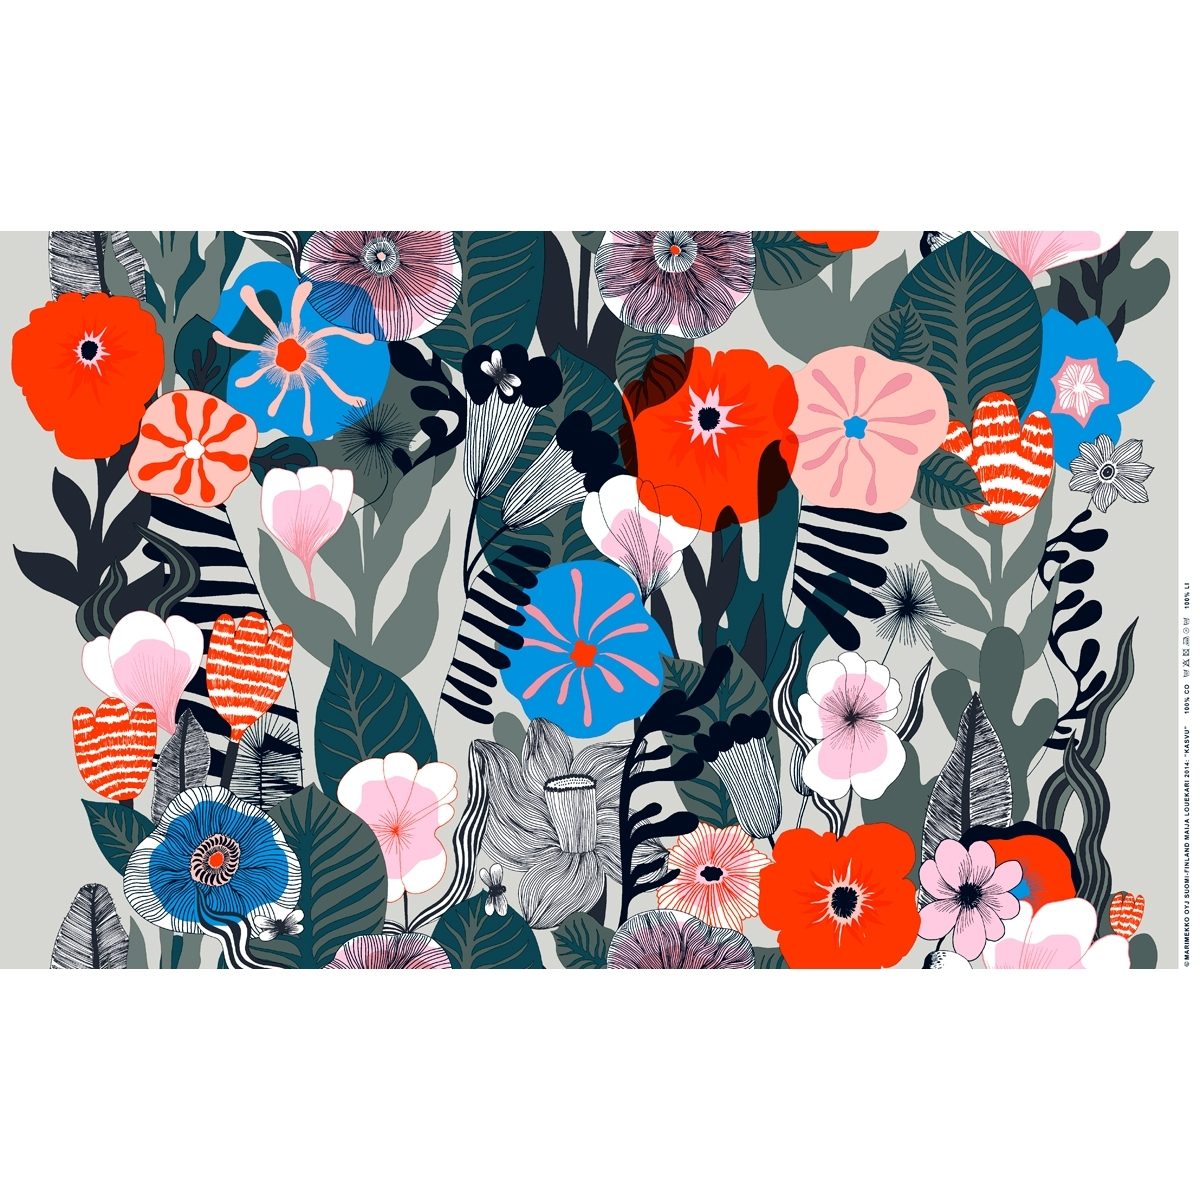 Marimekko Kasvu Grey Pvc Fabric 35 1,200×1,200 Pixels | Home Throughout Recent Marimekko 'kevatjuhla' Fabric Wall Art (View 13 of 15)